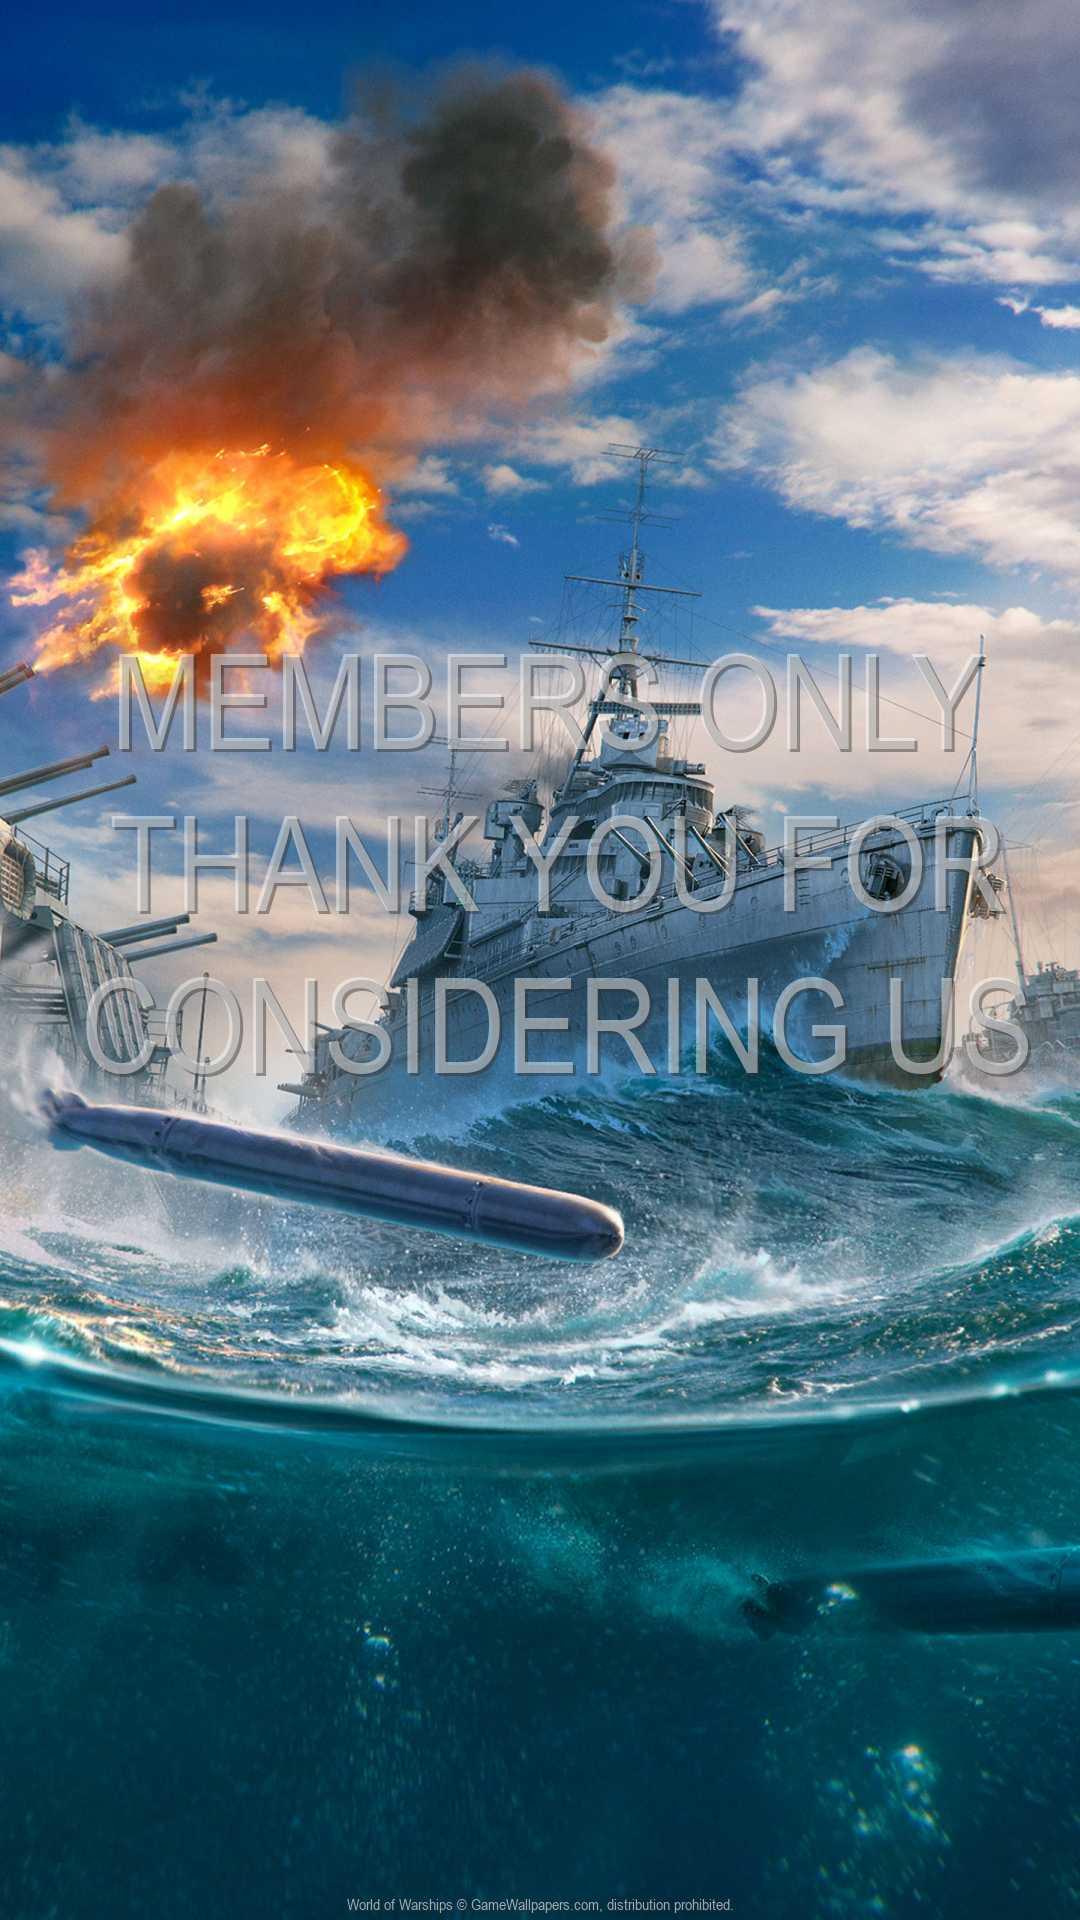 World of Warships 1080p Vertical Handy Hintergrundbild 15